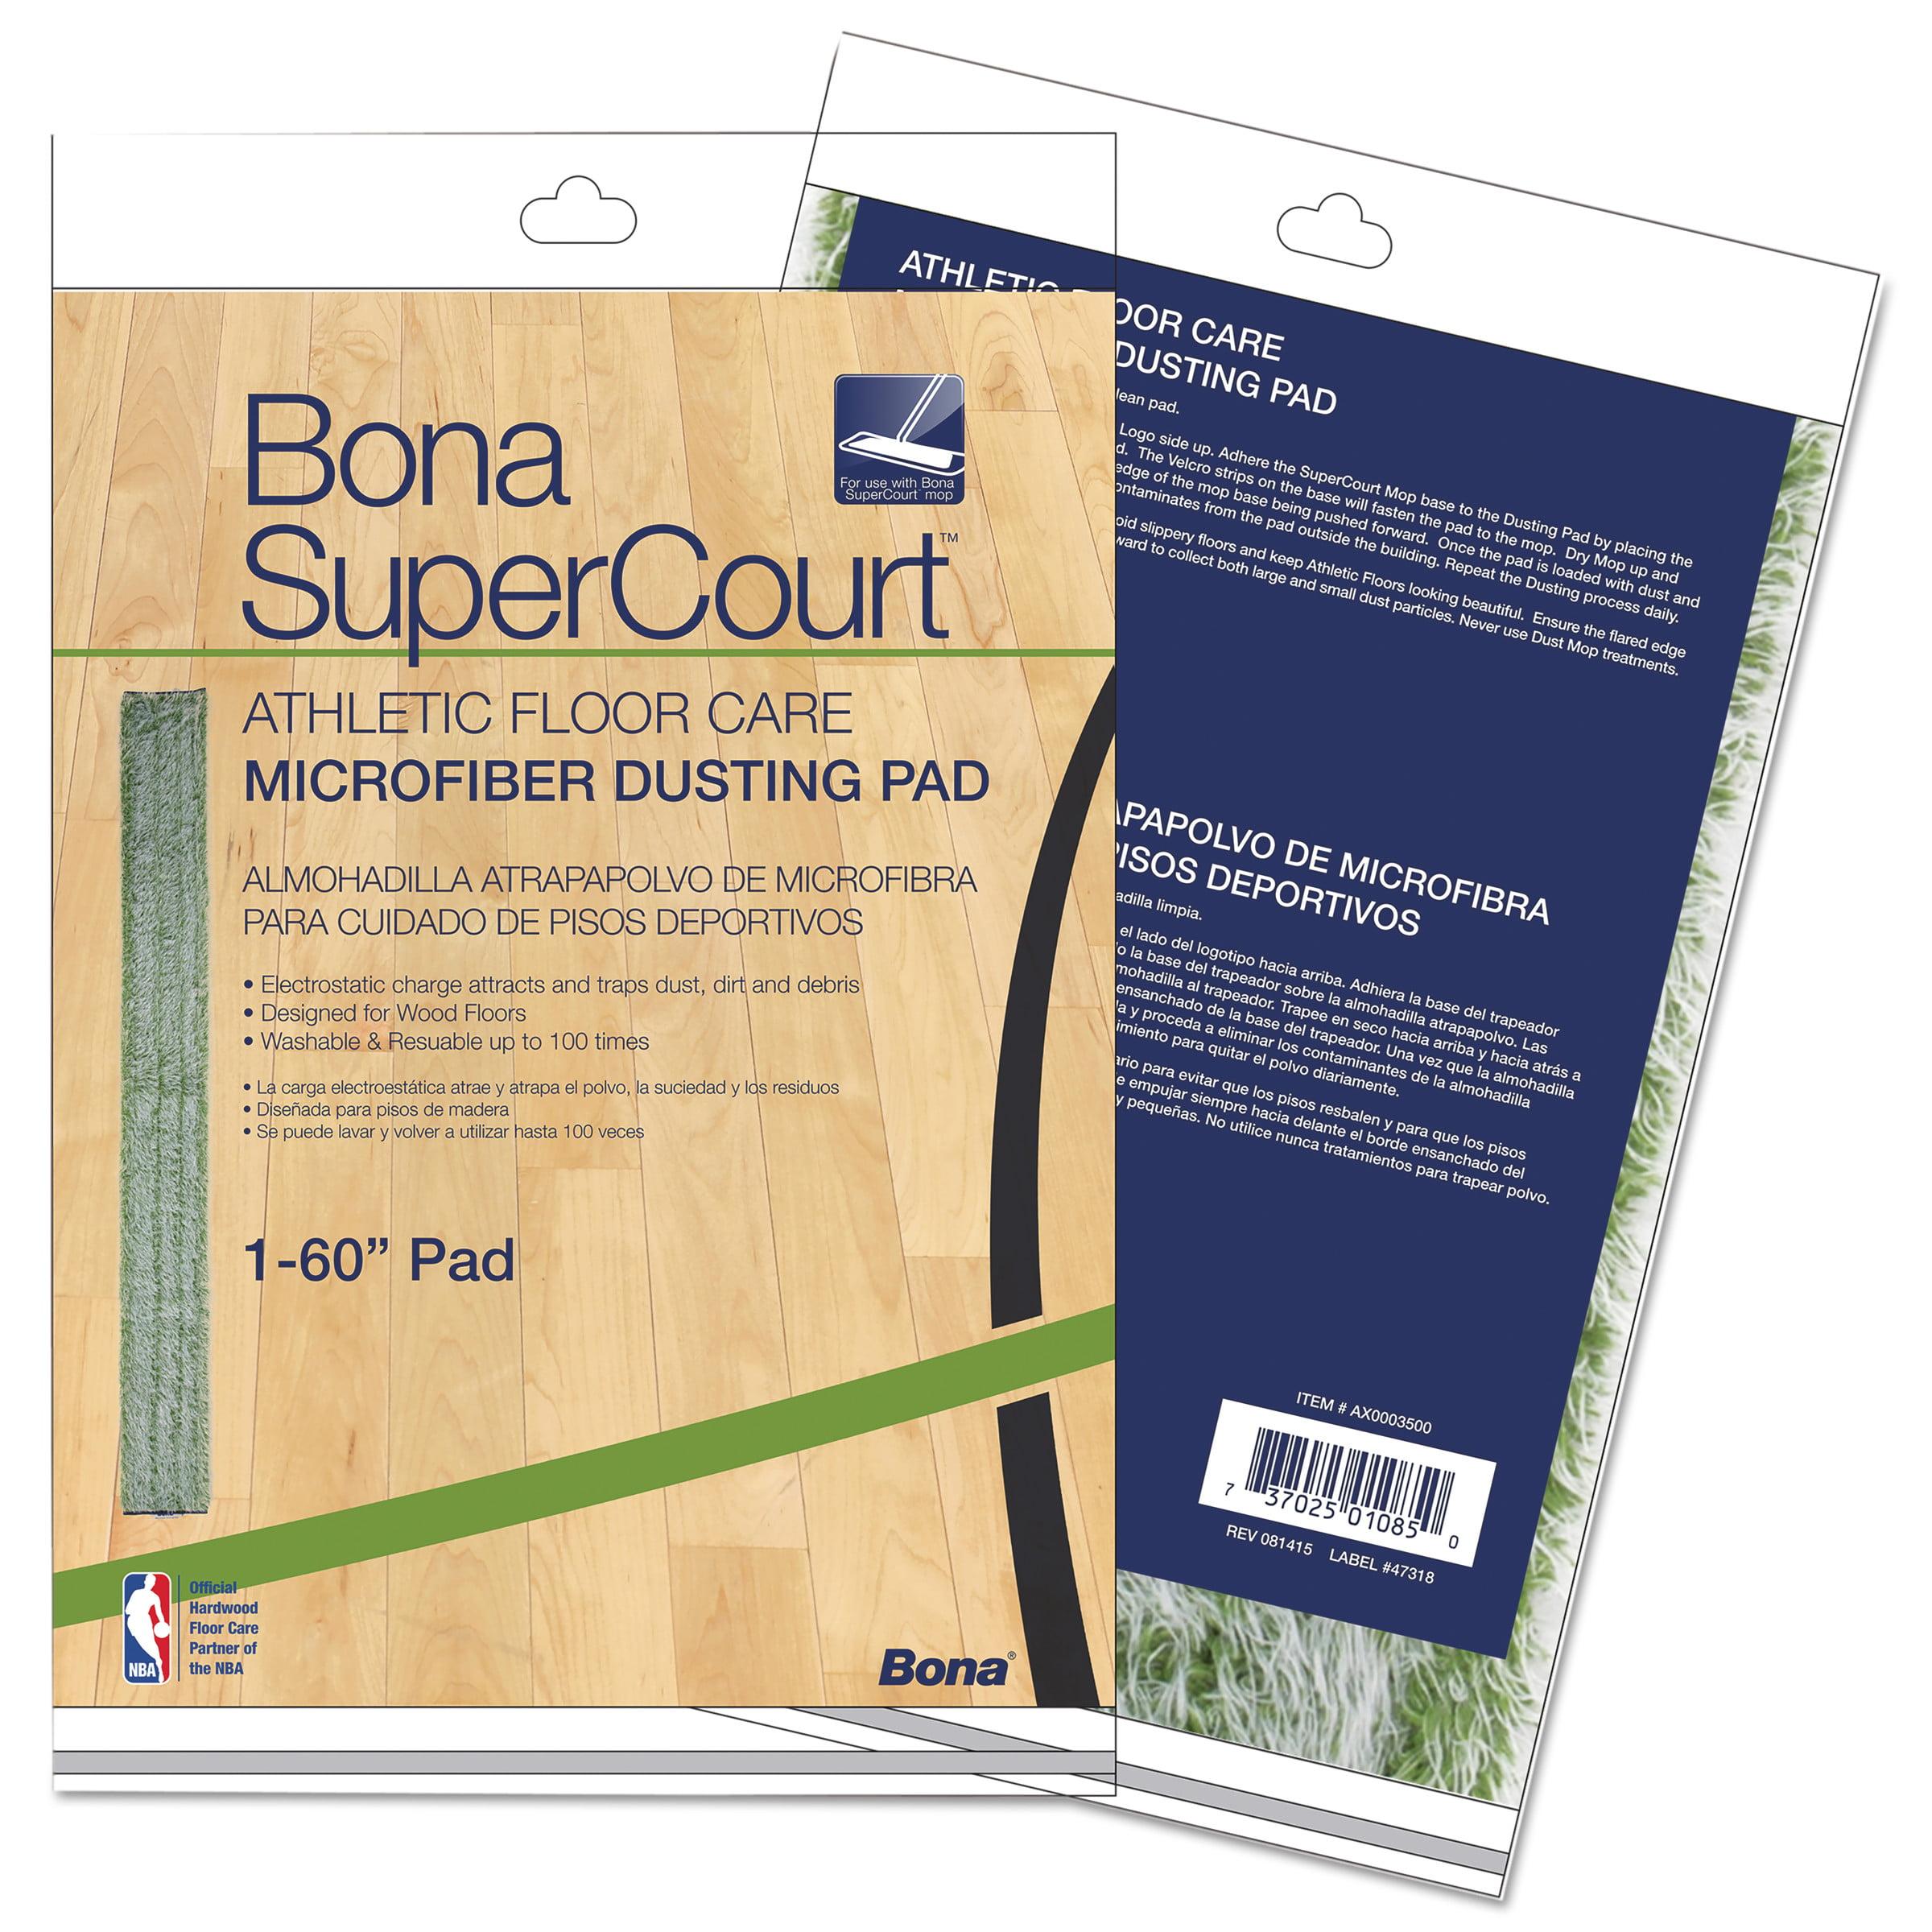 "Bona SuperCourt Athletic Floor Care Microfiber Dusting Pad, 60"", Green"